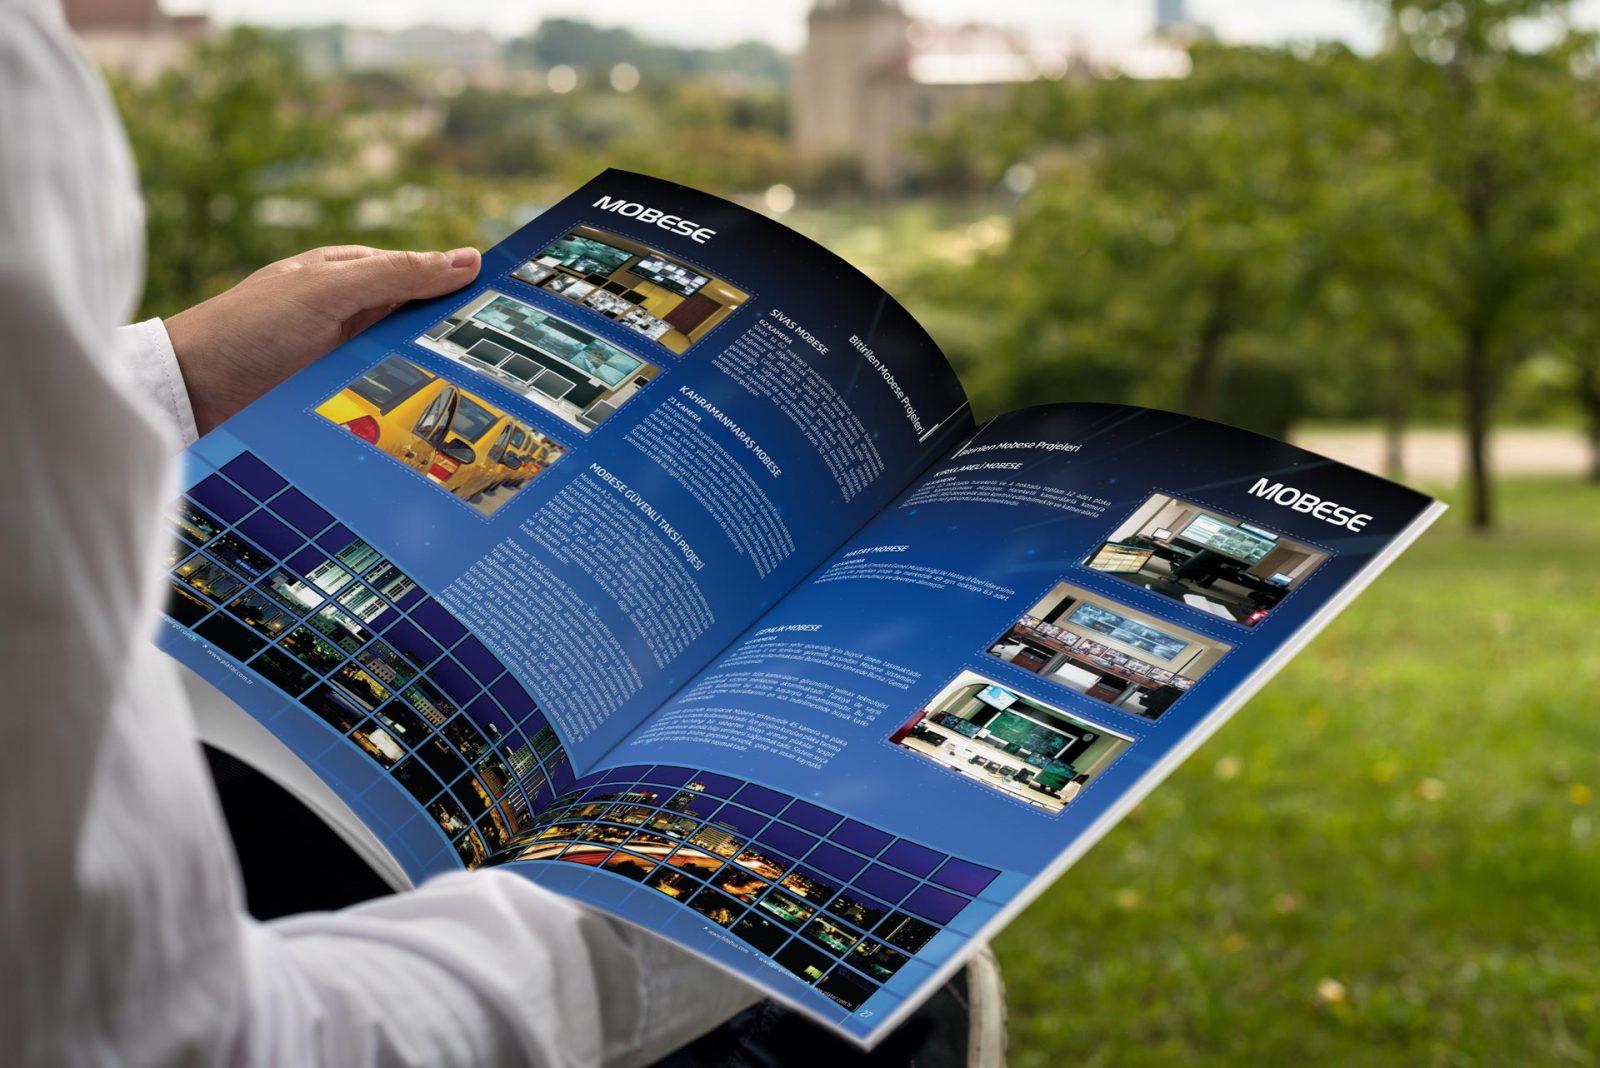 fideltus katalog tasarımı 14